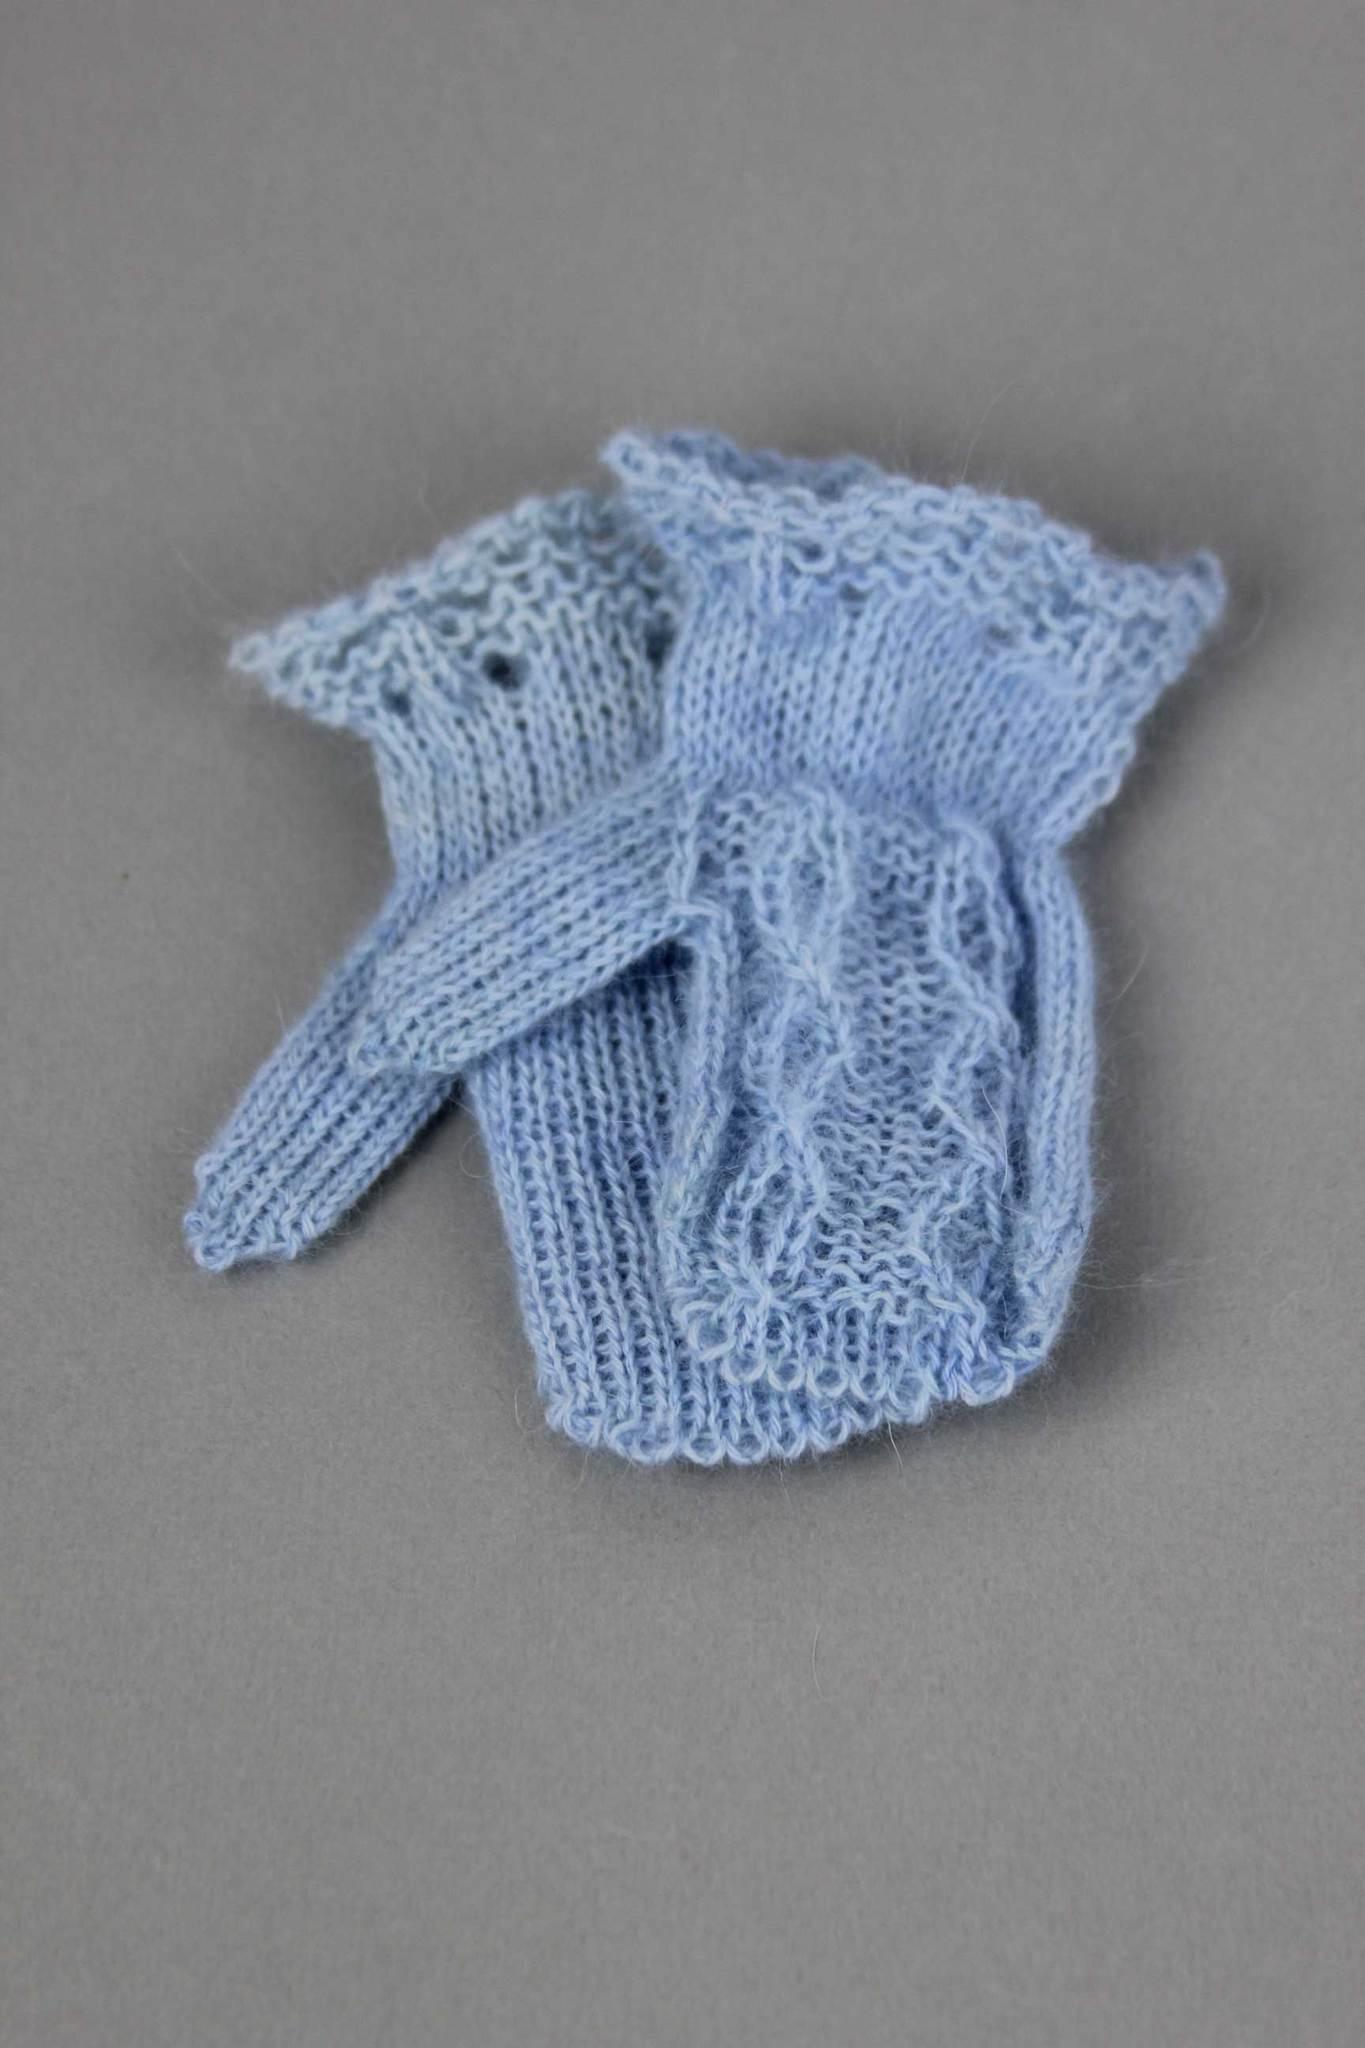 Angora_newborn_mittens_blue_56